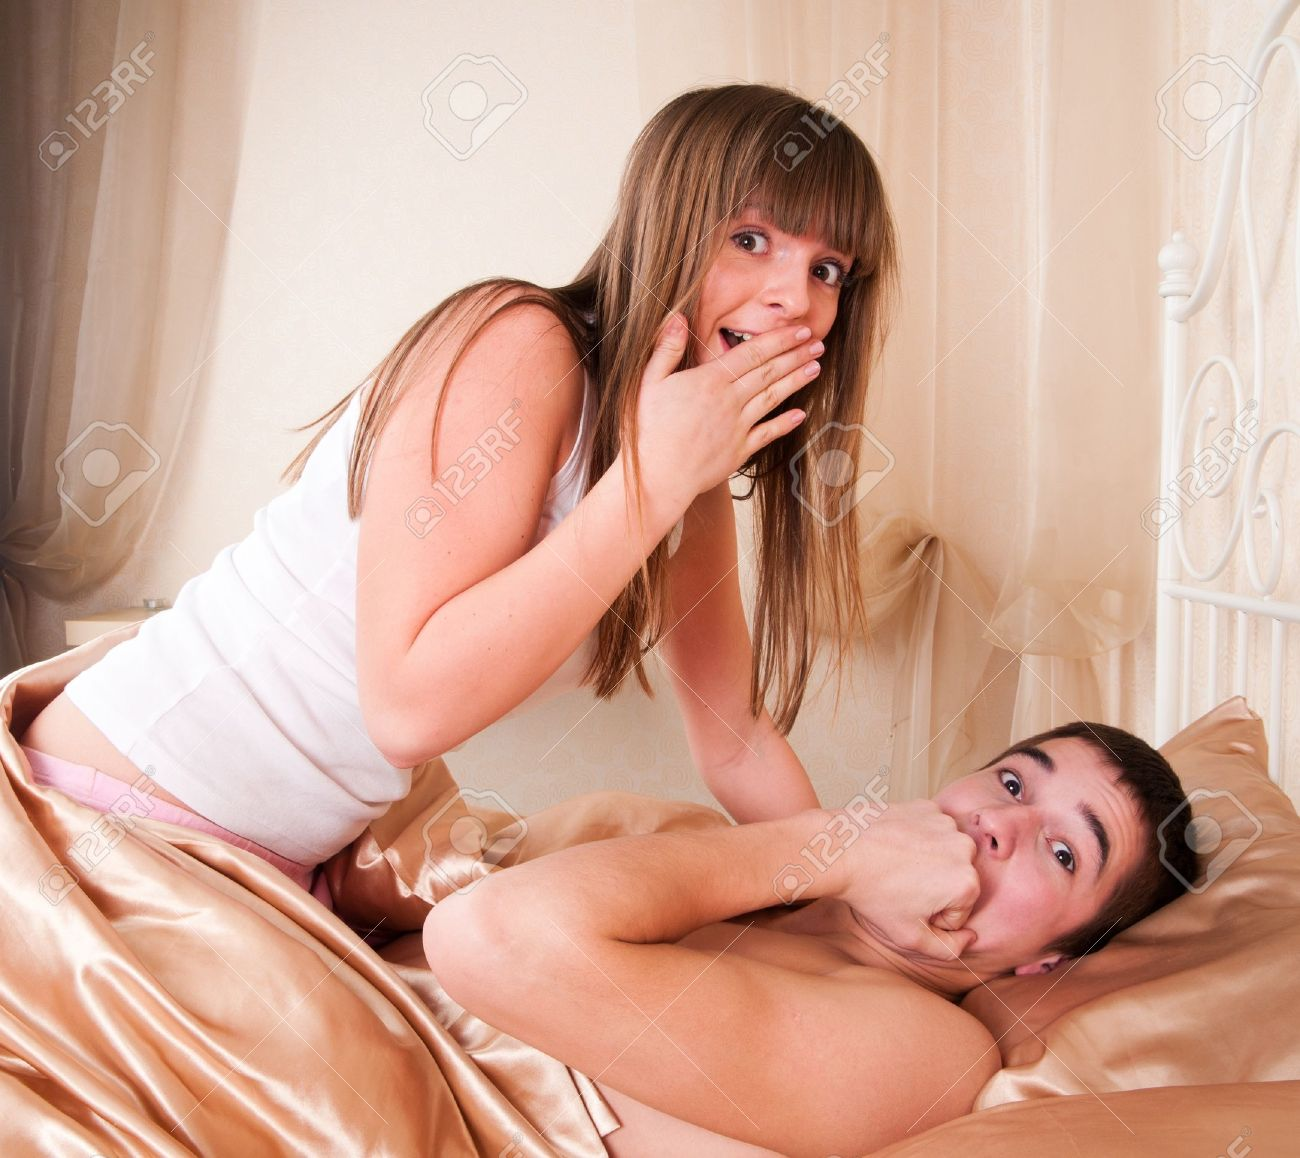 Pareja de sexo sorprendido tumbado en la cama  Foto de archivo - 9354122